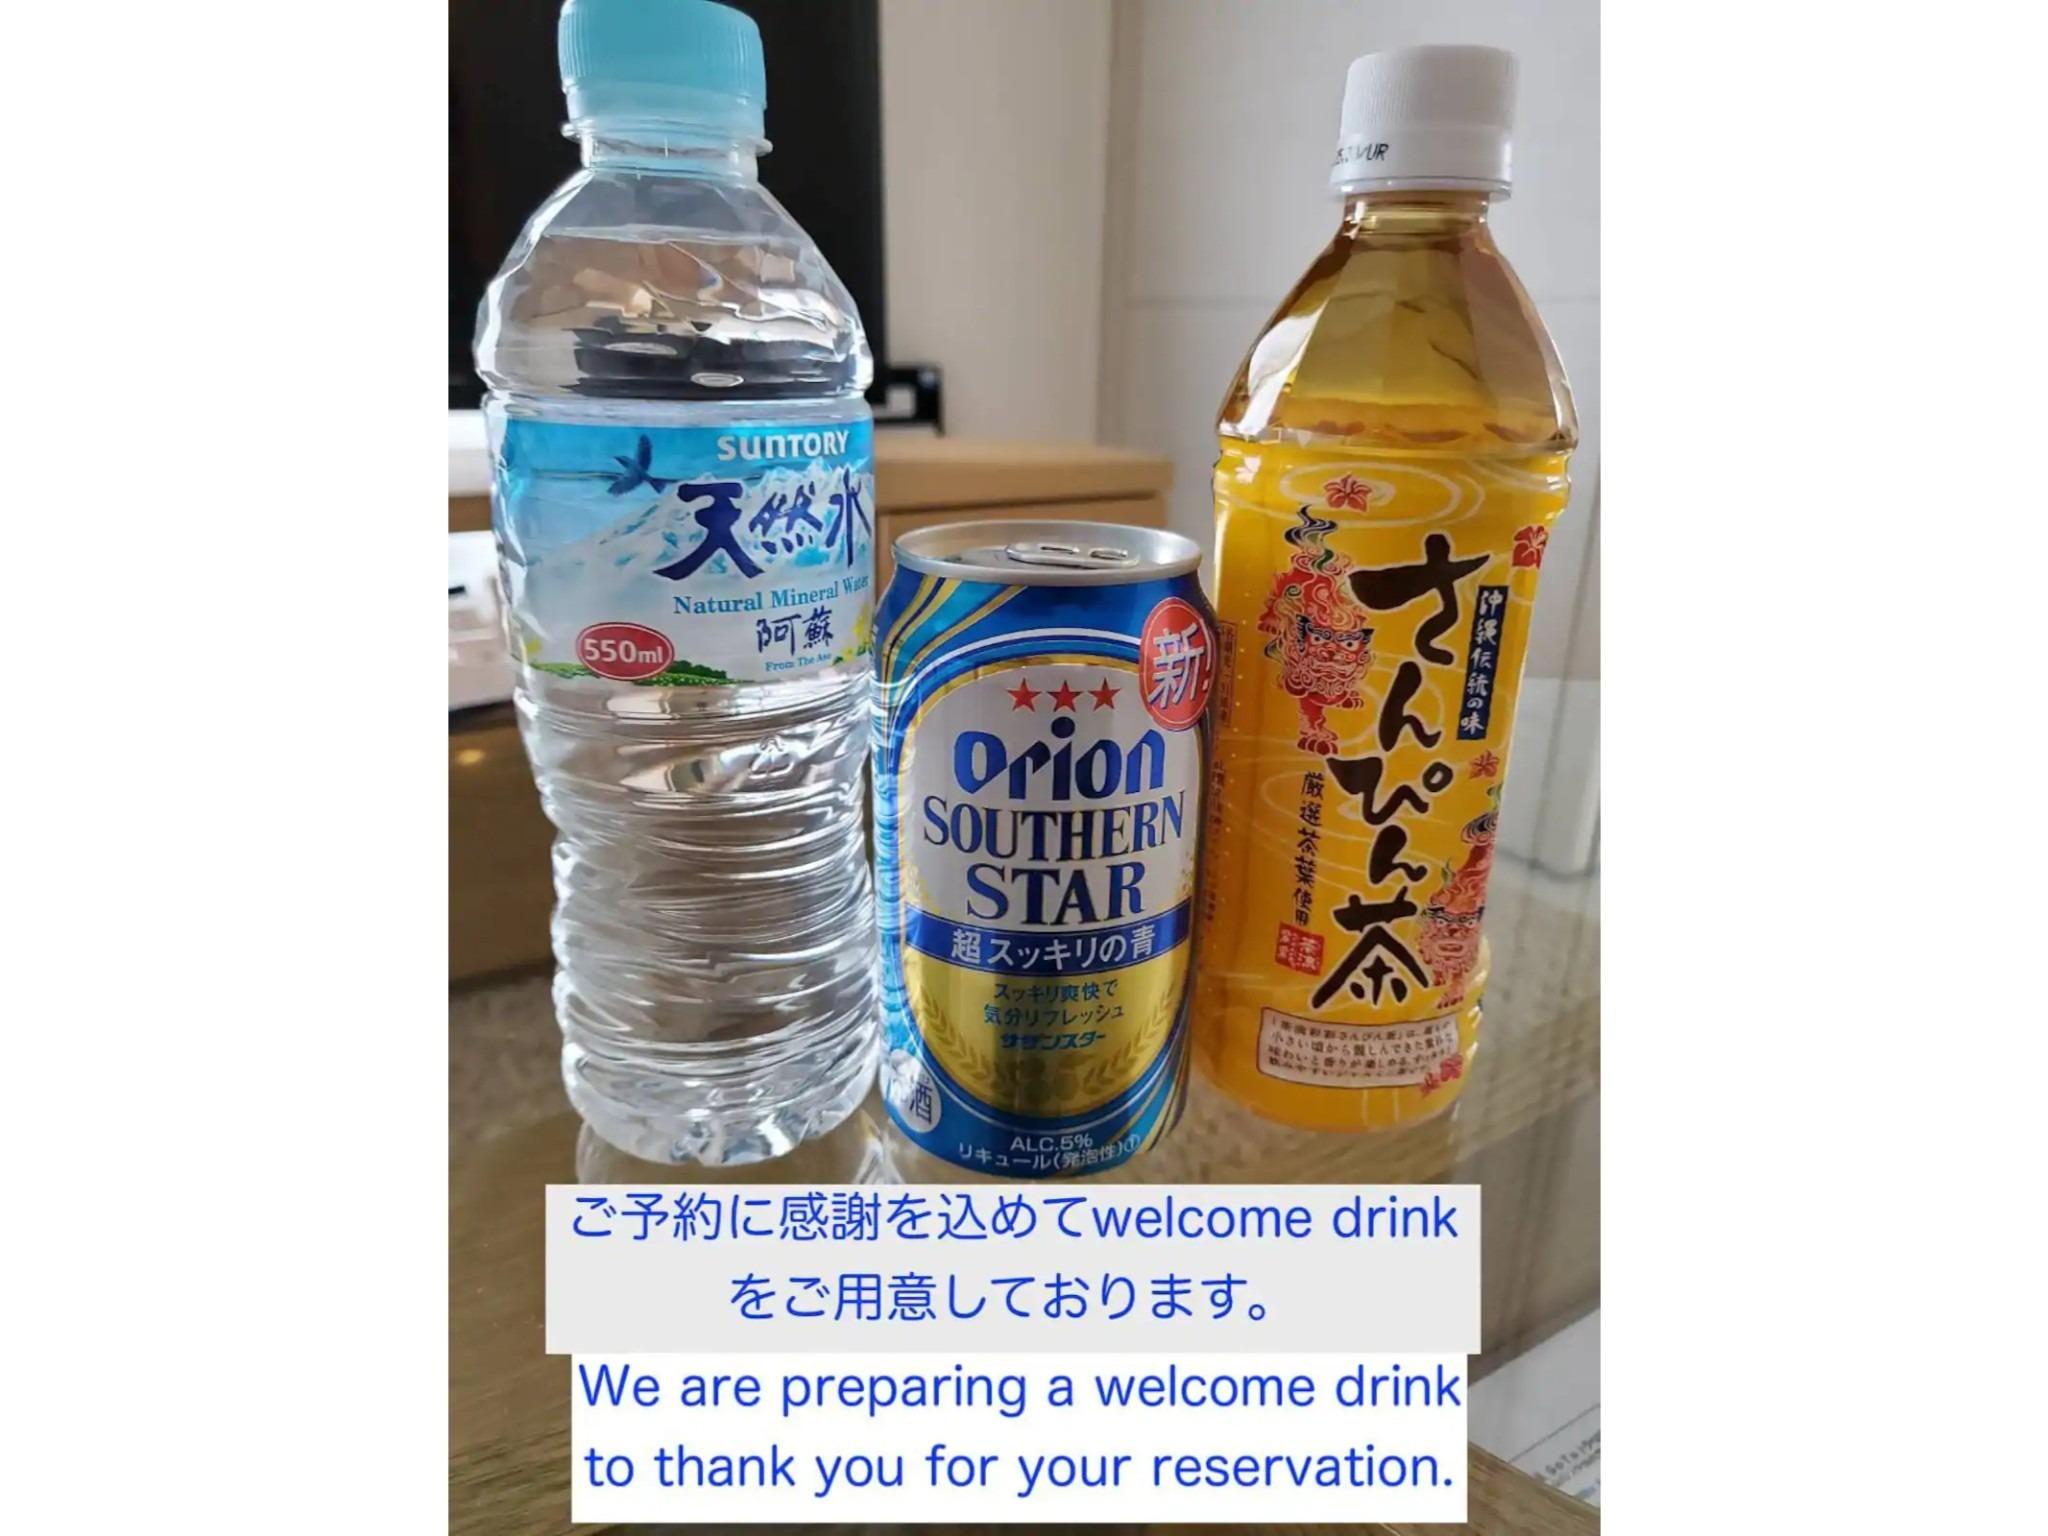 wifi&駐車場&乾燥機完備☆浦添市2DK☆空港まで車で20分☆長期滞在歓迎(301)